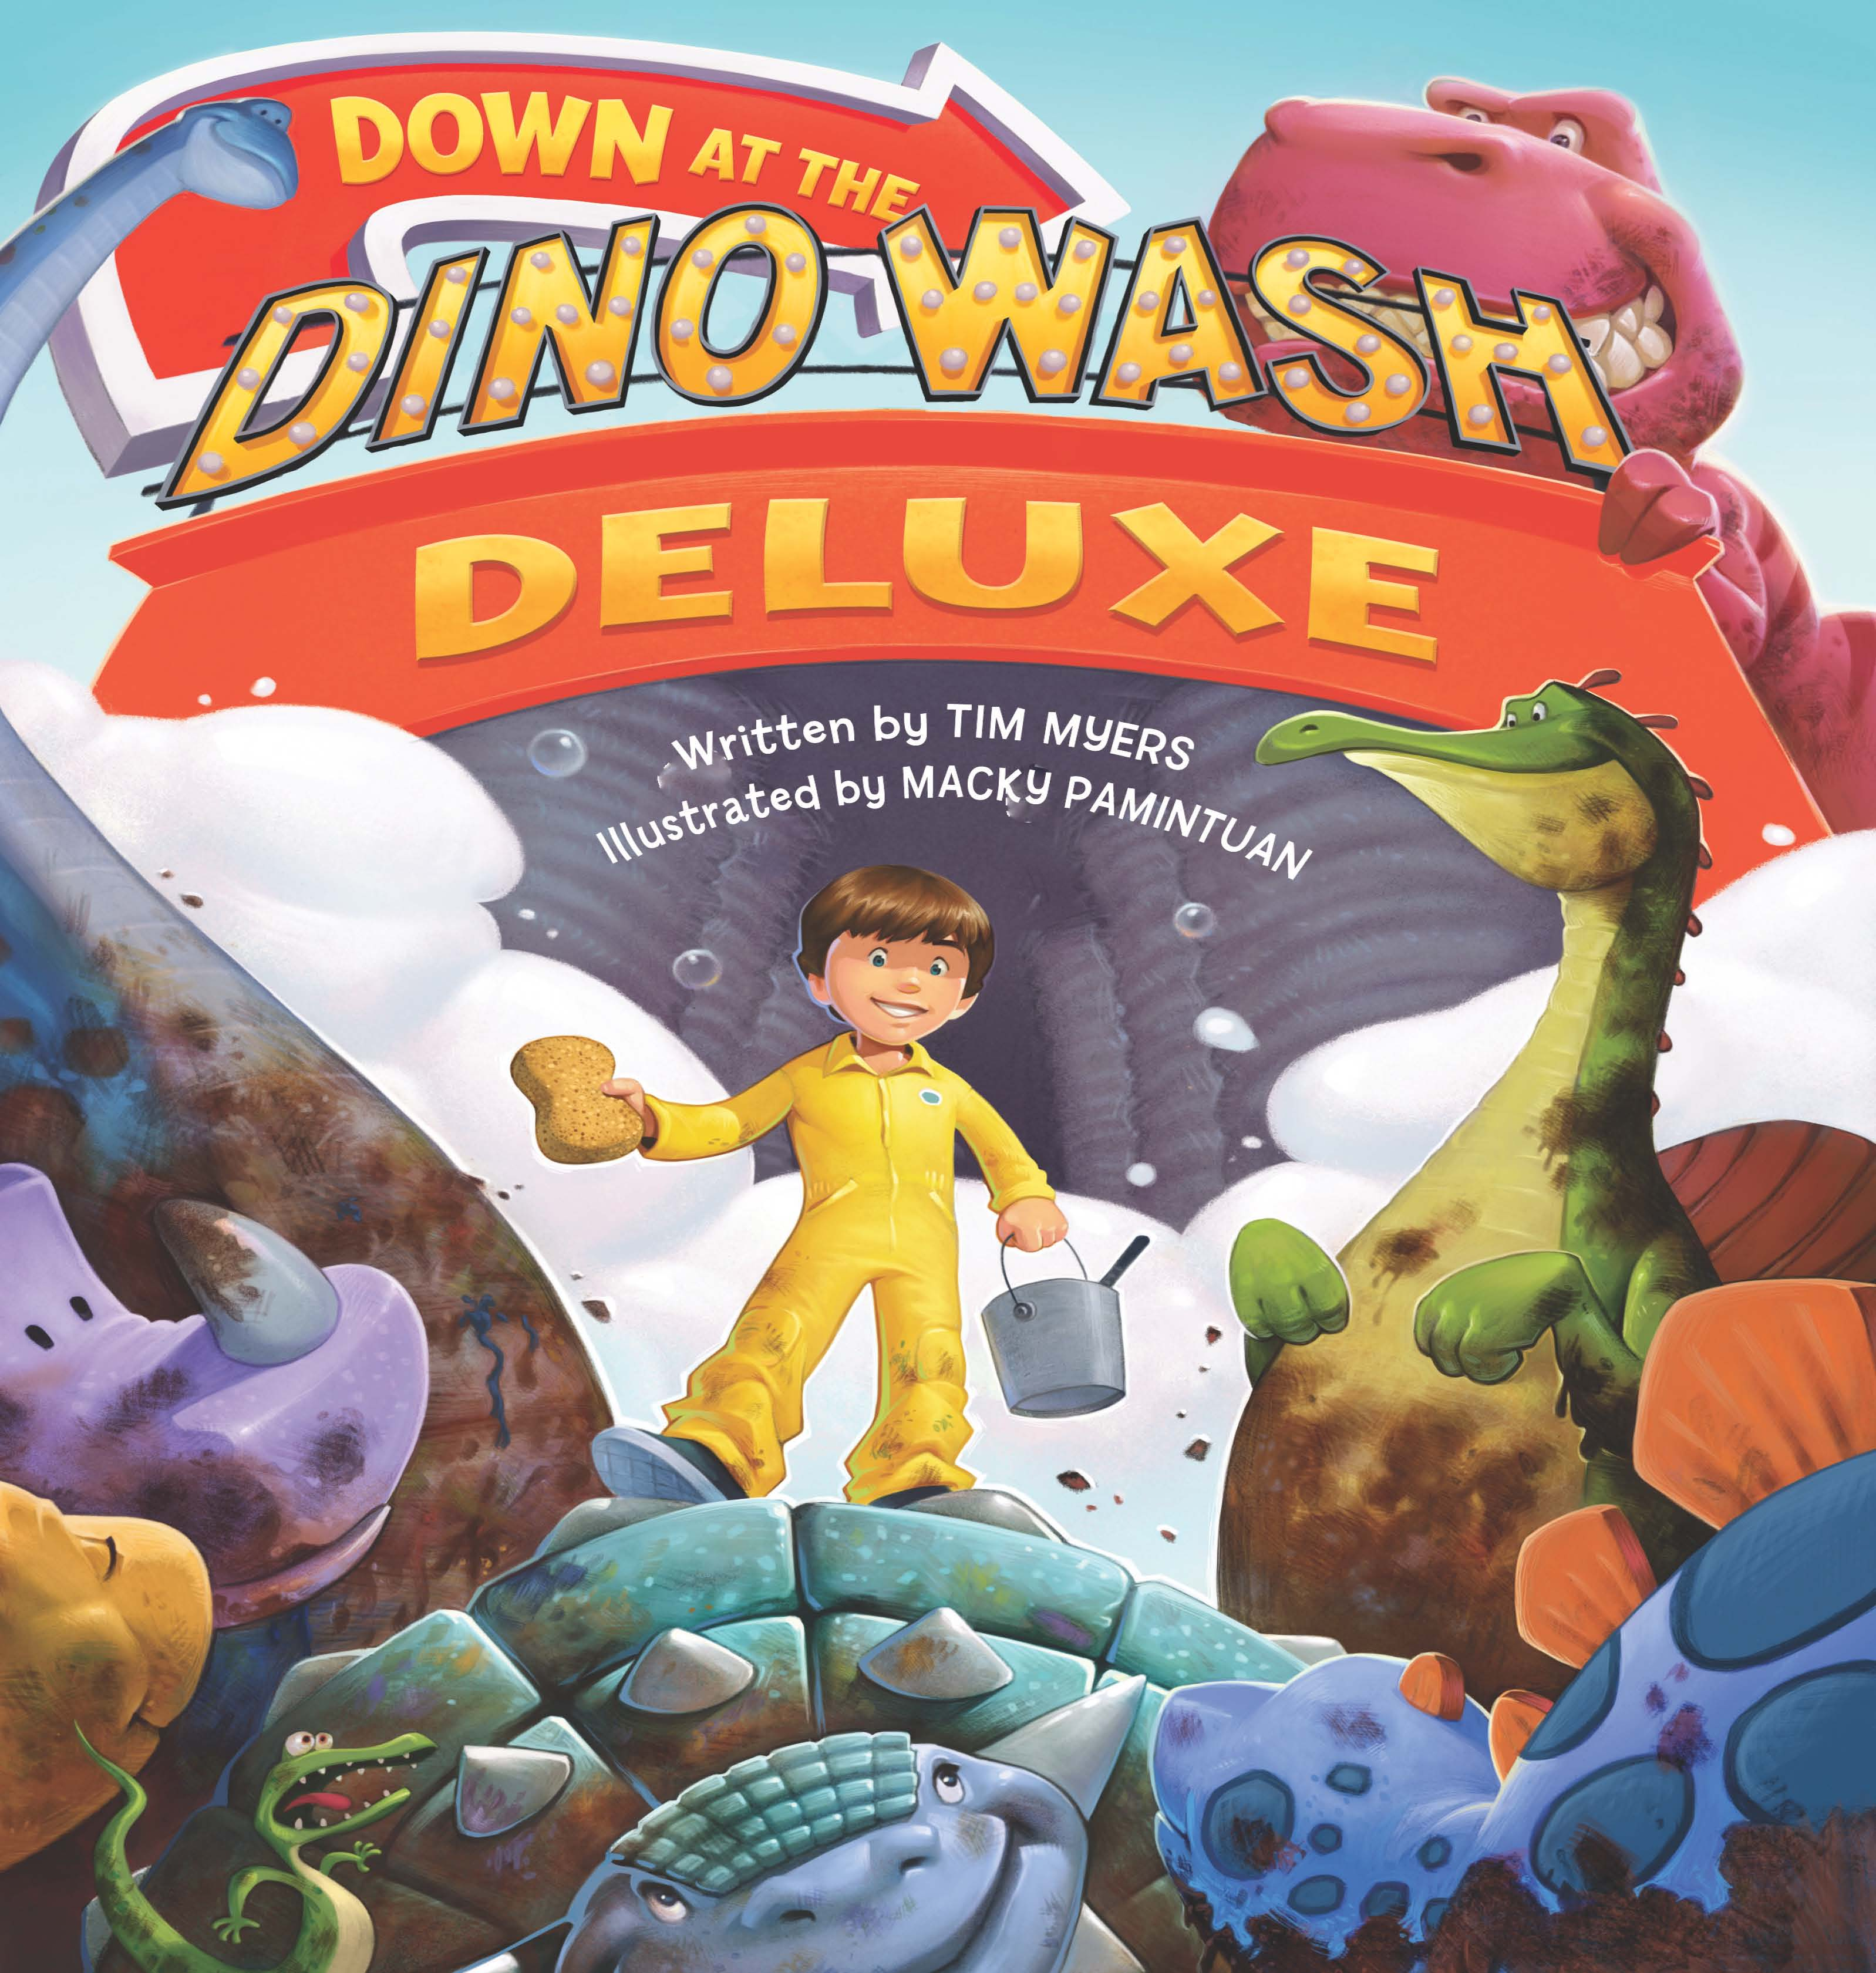 Down at the Dino Wash